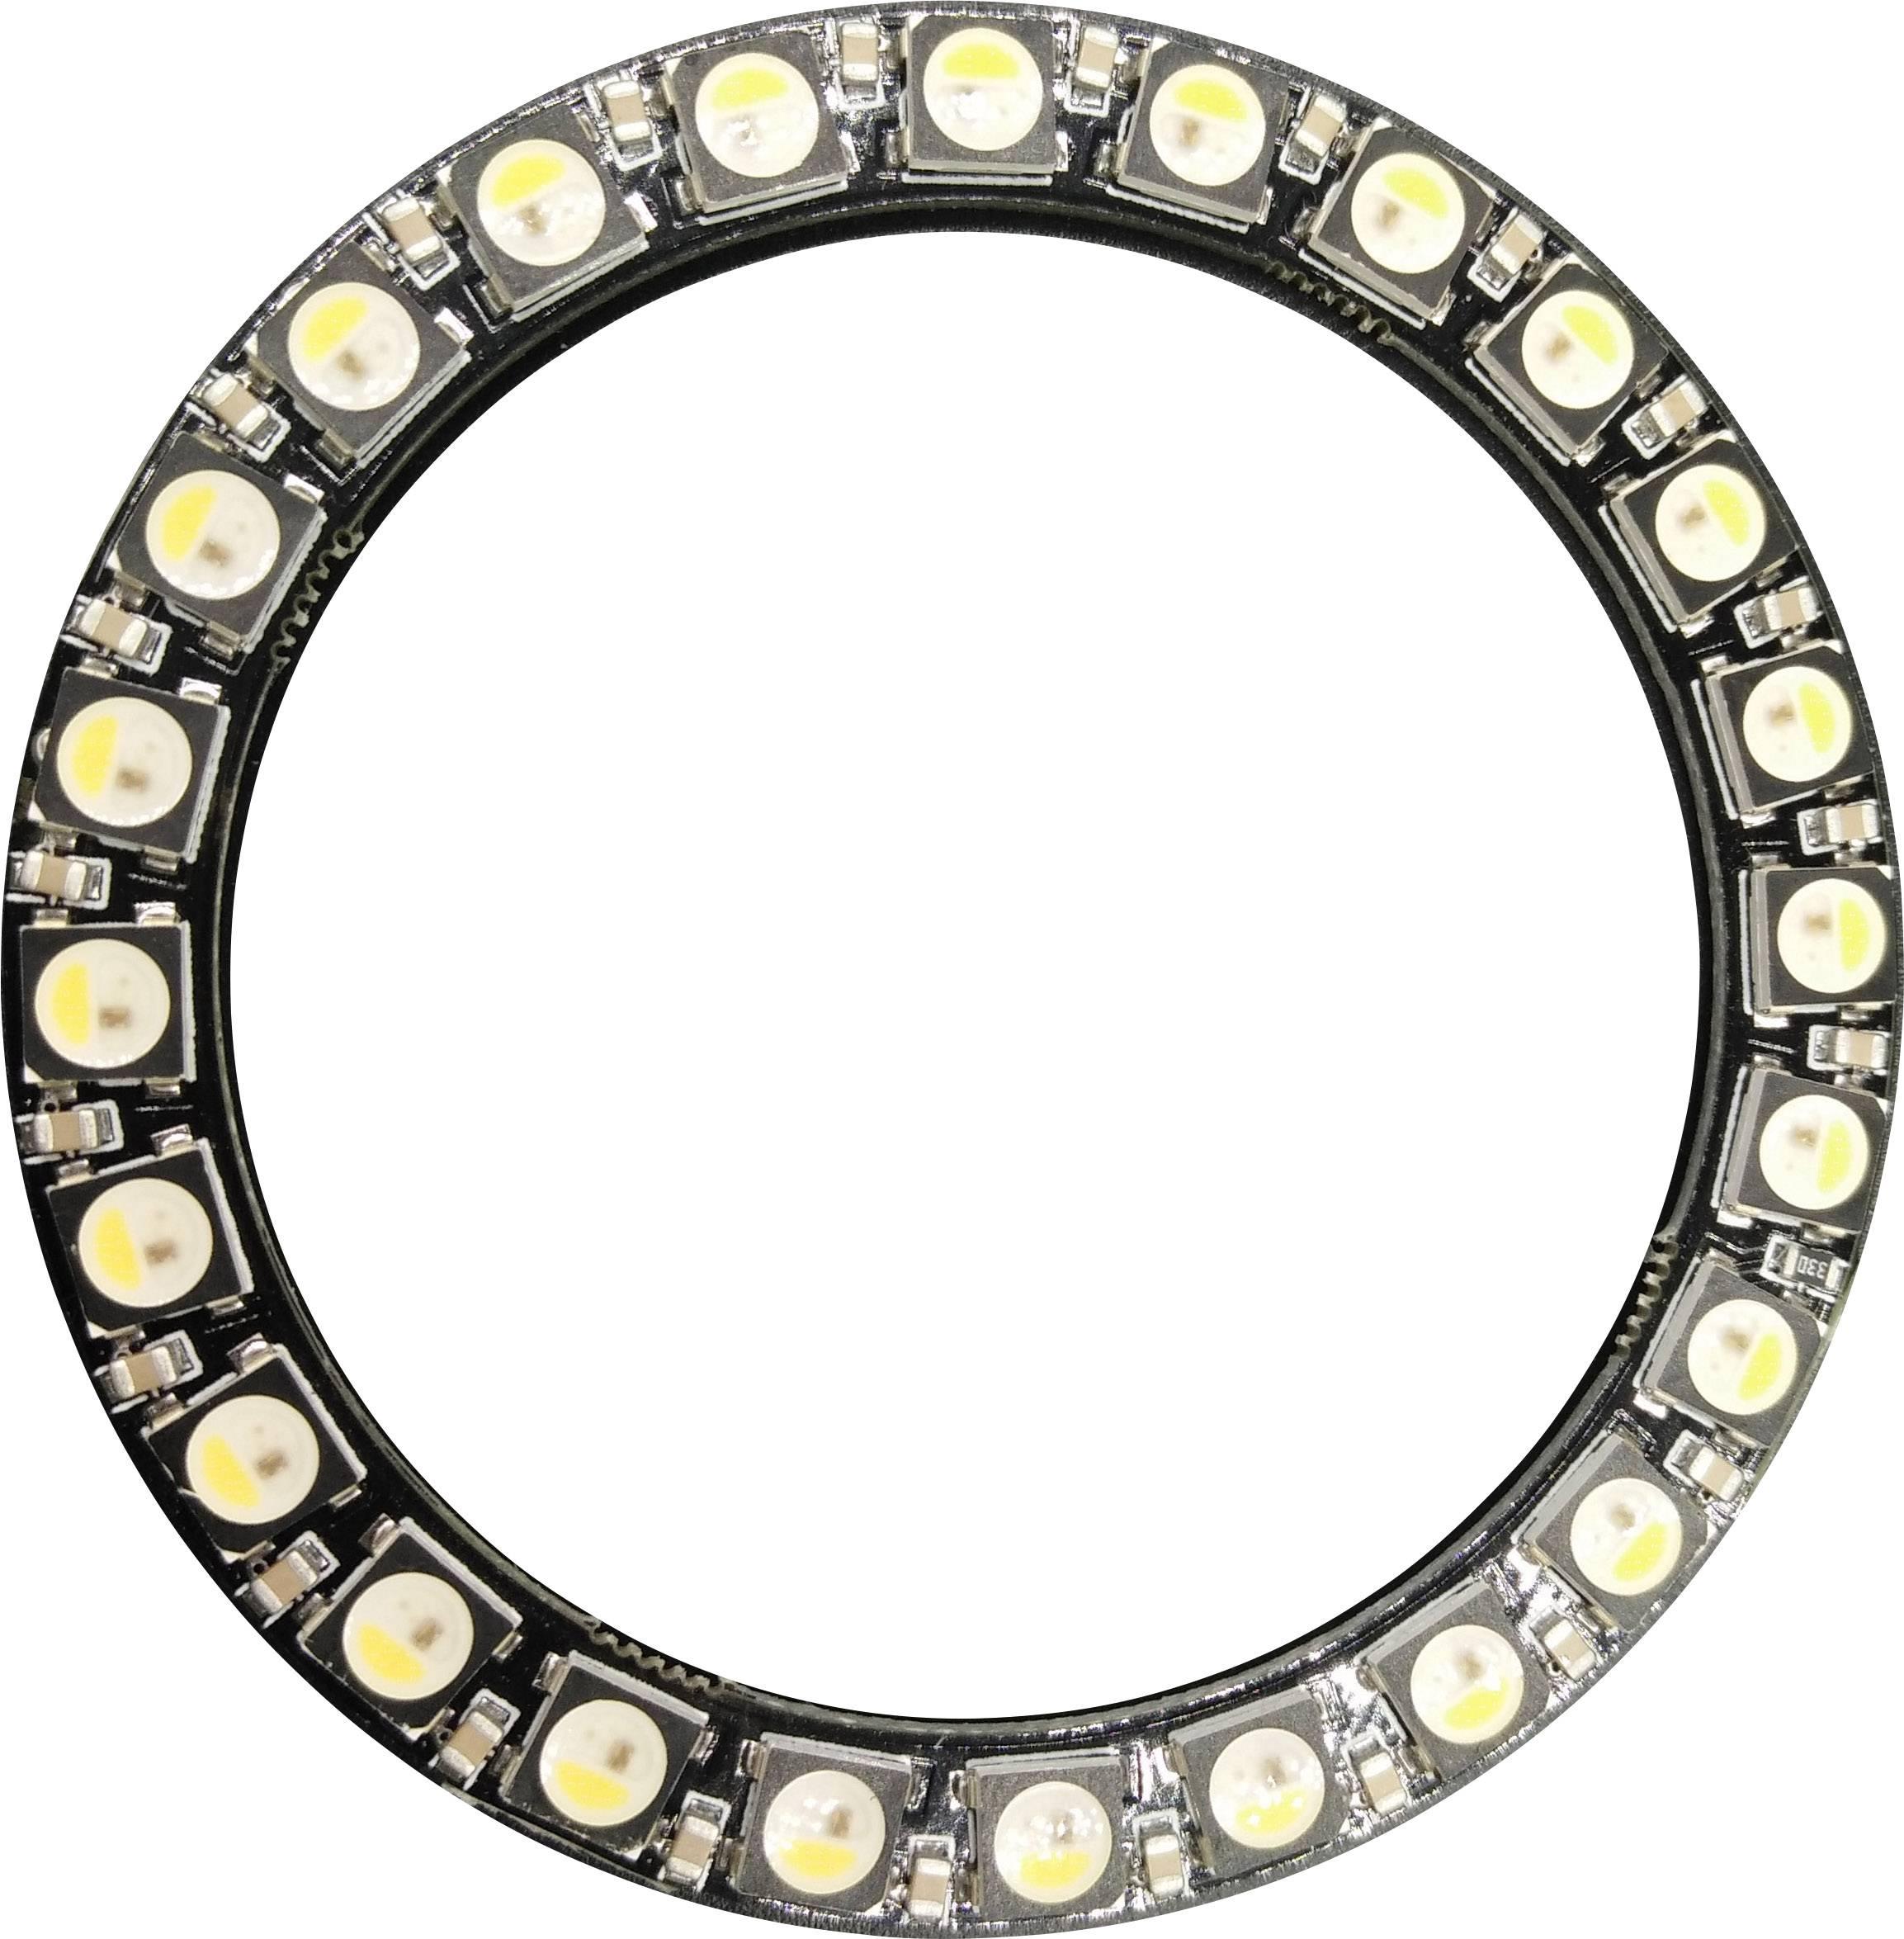 HighPower LED Thomsen LED-RING-24-RGBW-SK, 120 °, 8 lm, 7.20 W, 5 V, RGBW